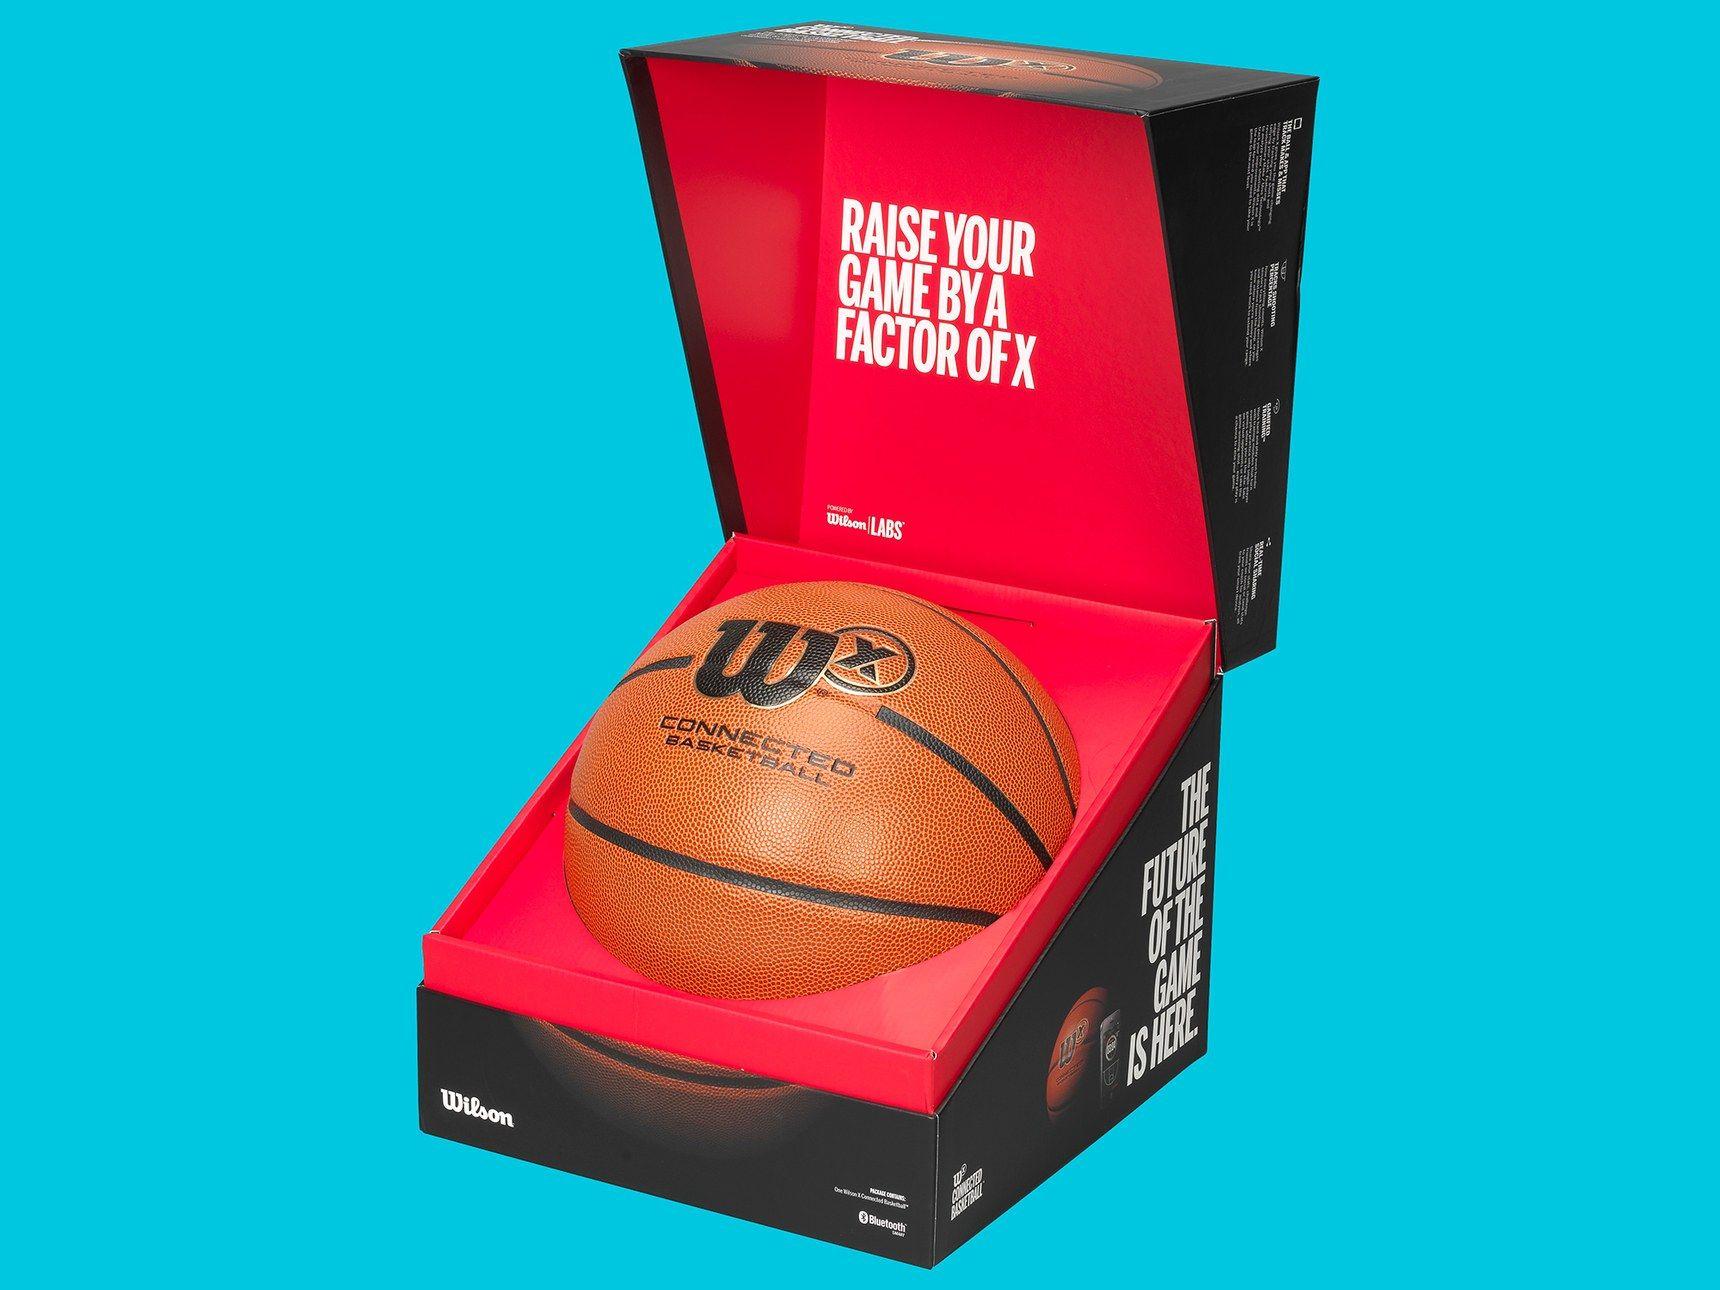 Wilson S New Smart Basketball Magically Tracks Your Stats Basketball Basketball App Brand Packaging